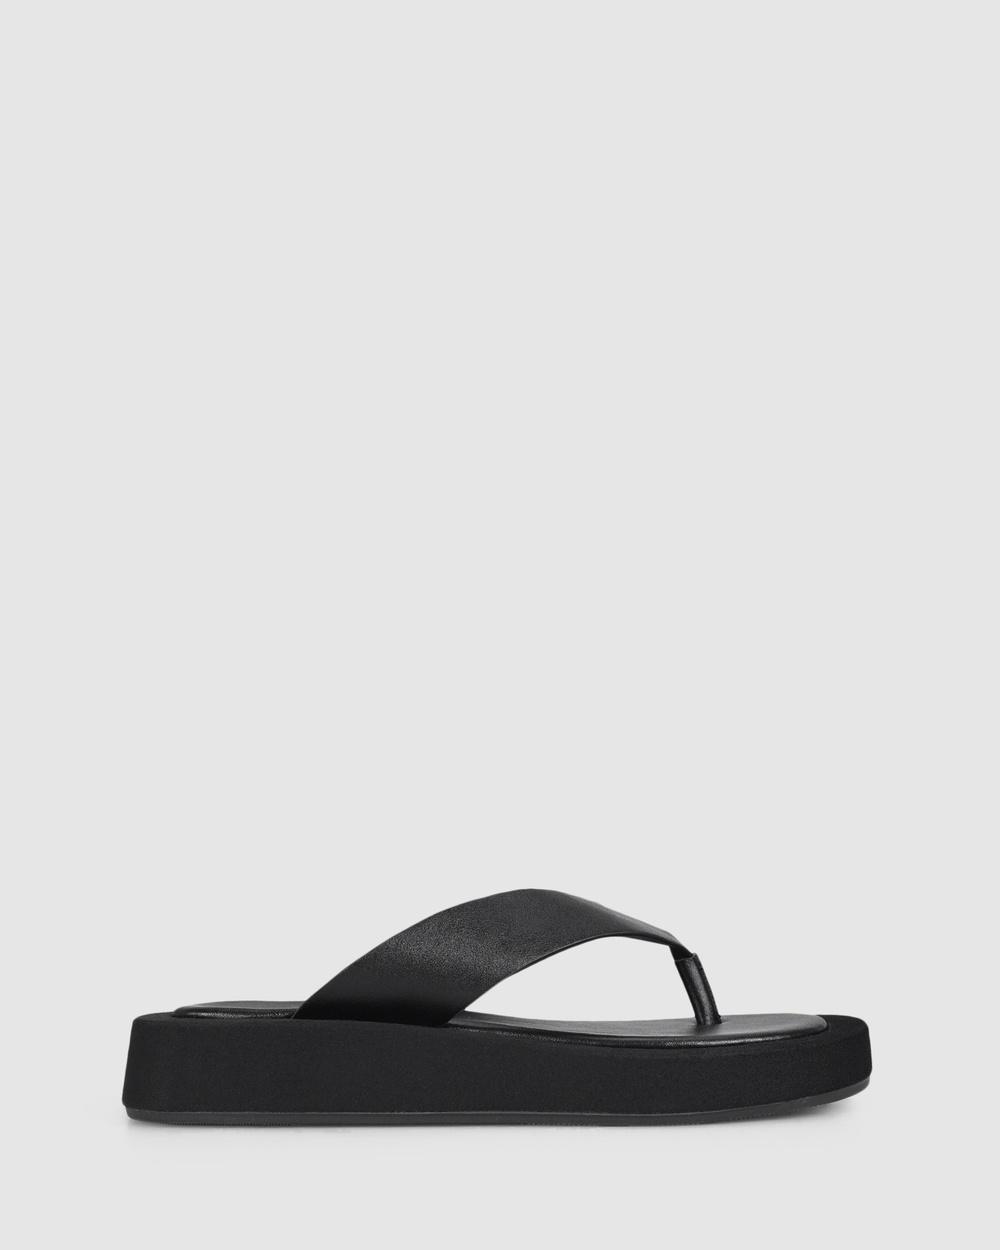 Verali Bouncer Thongs Black